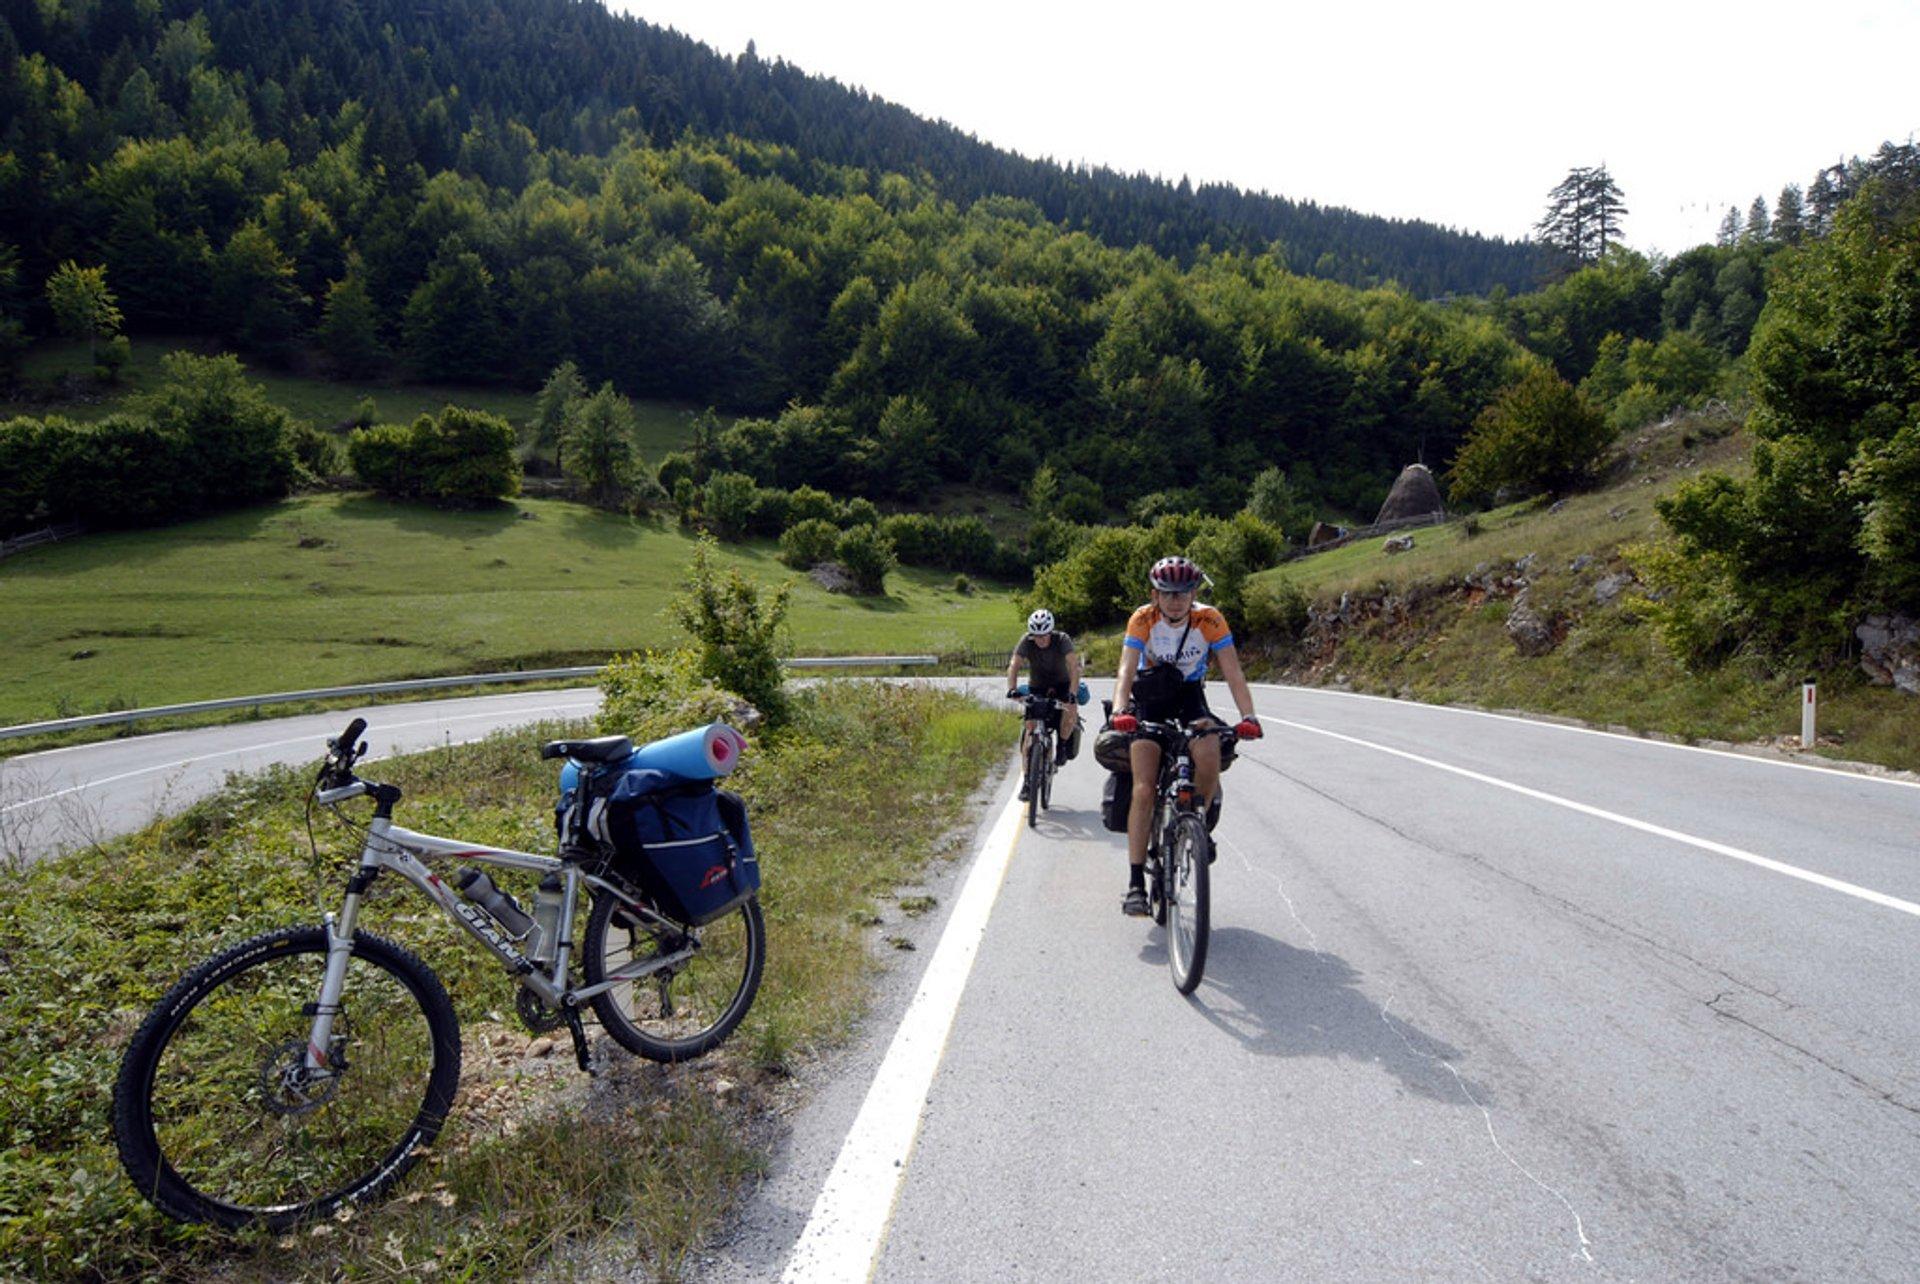 Best time for Biking in Montenegro 2019